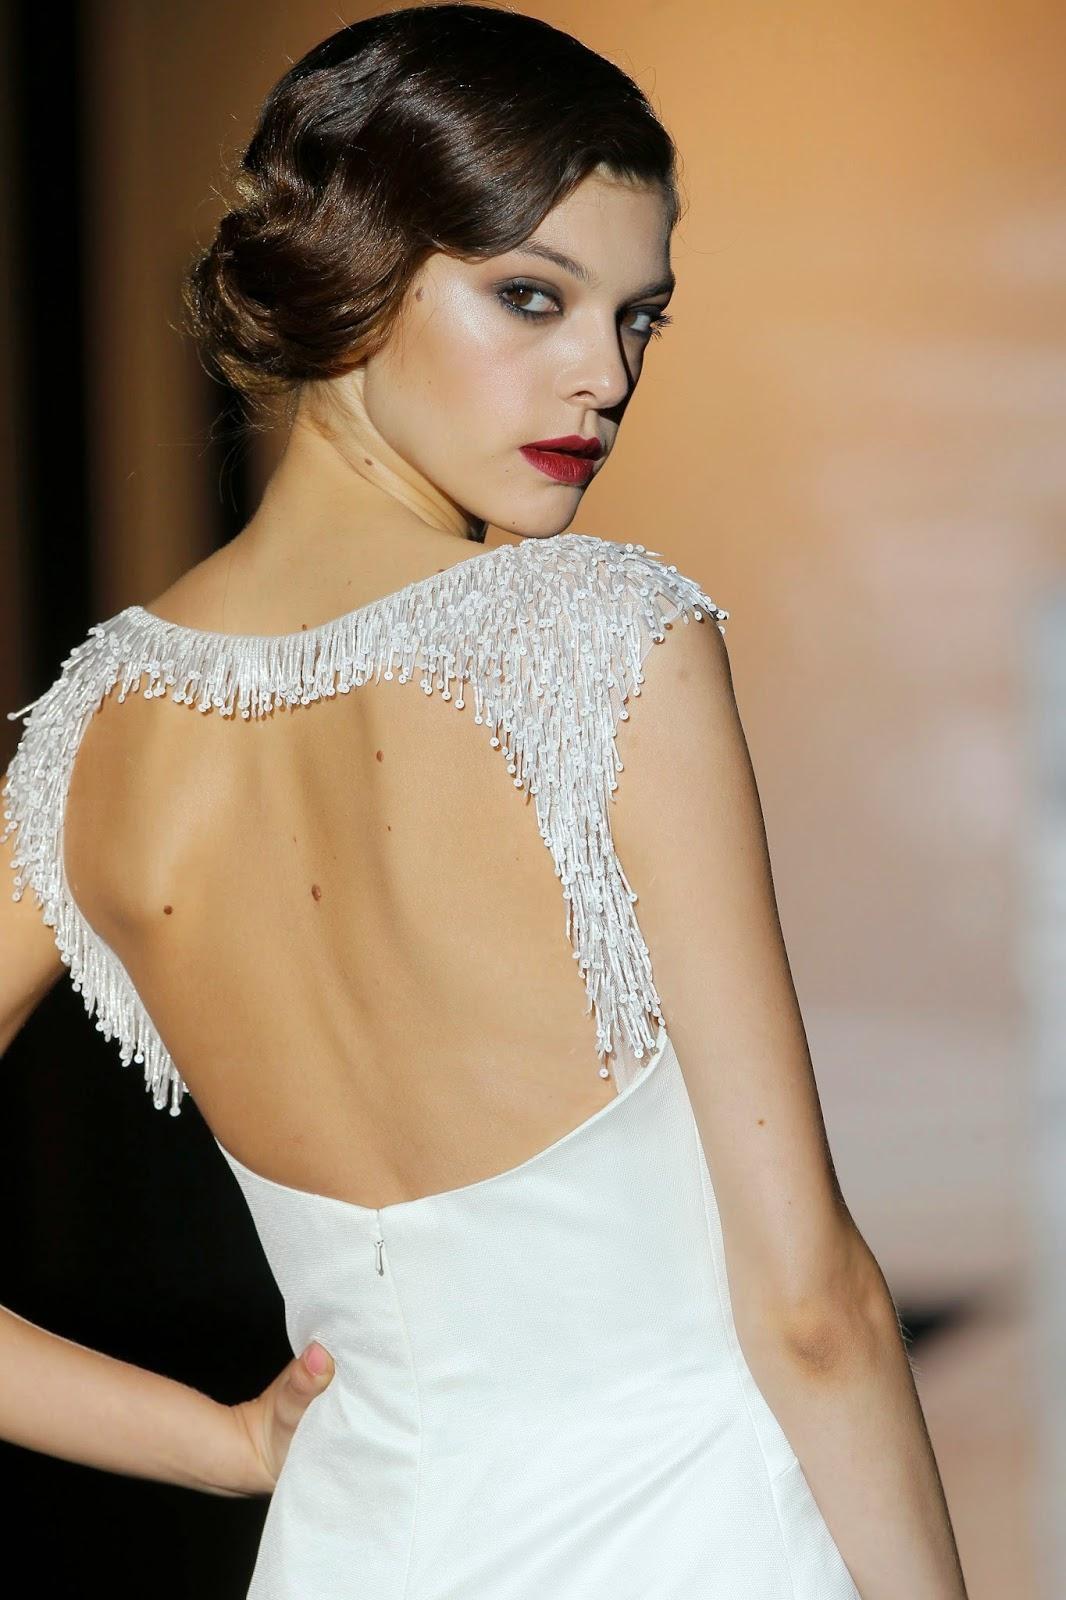 Mas de 50 ideas de peinados para novia estilista barcelona